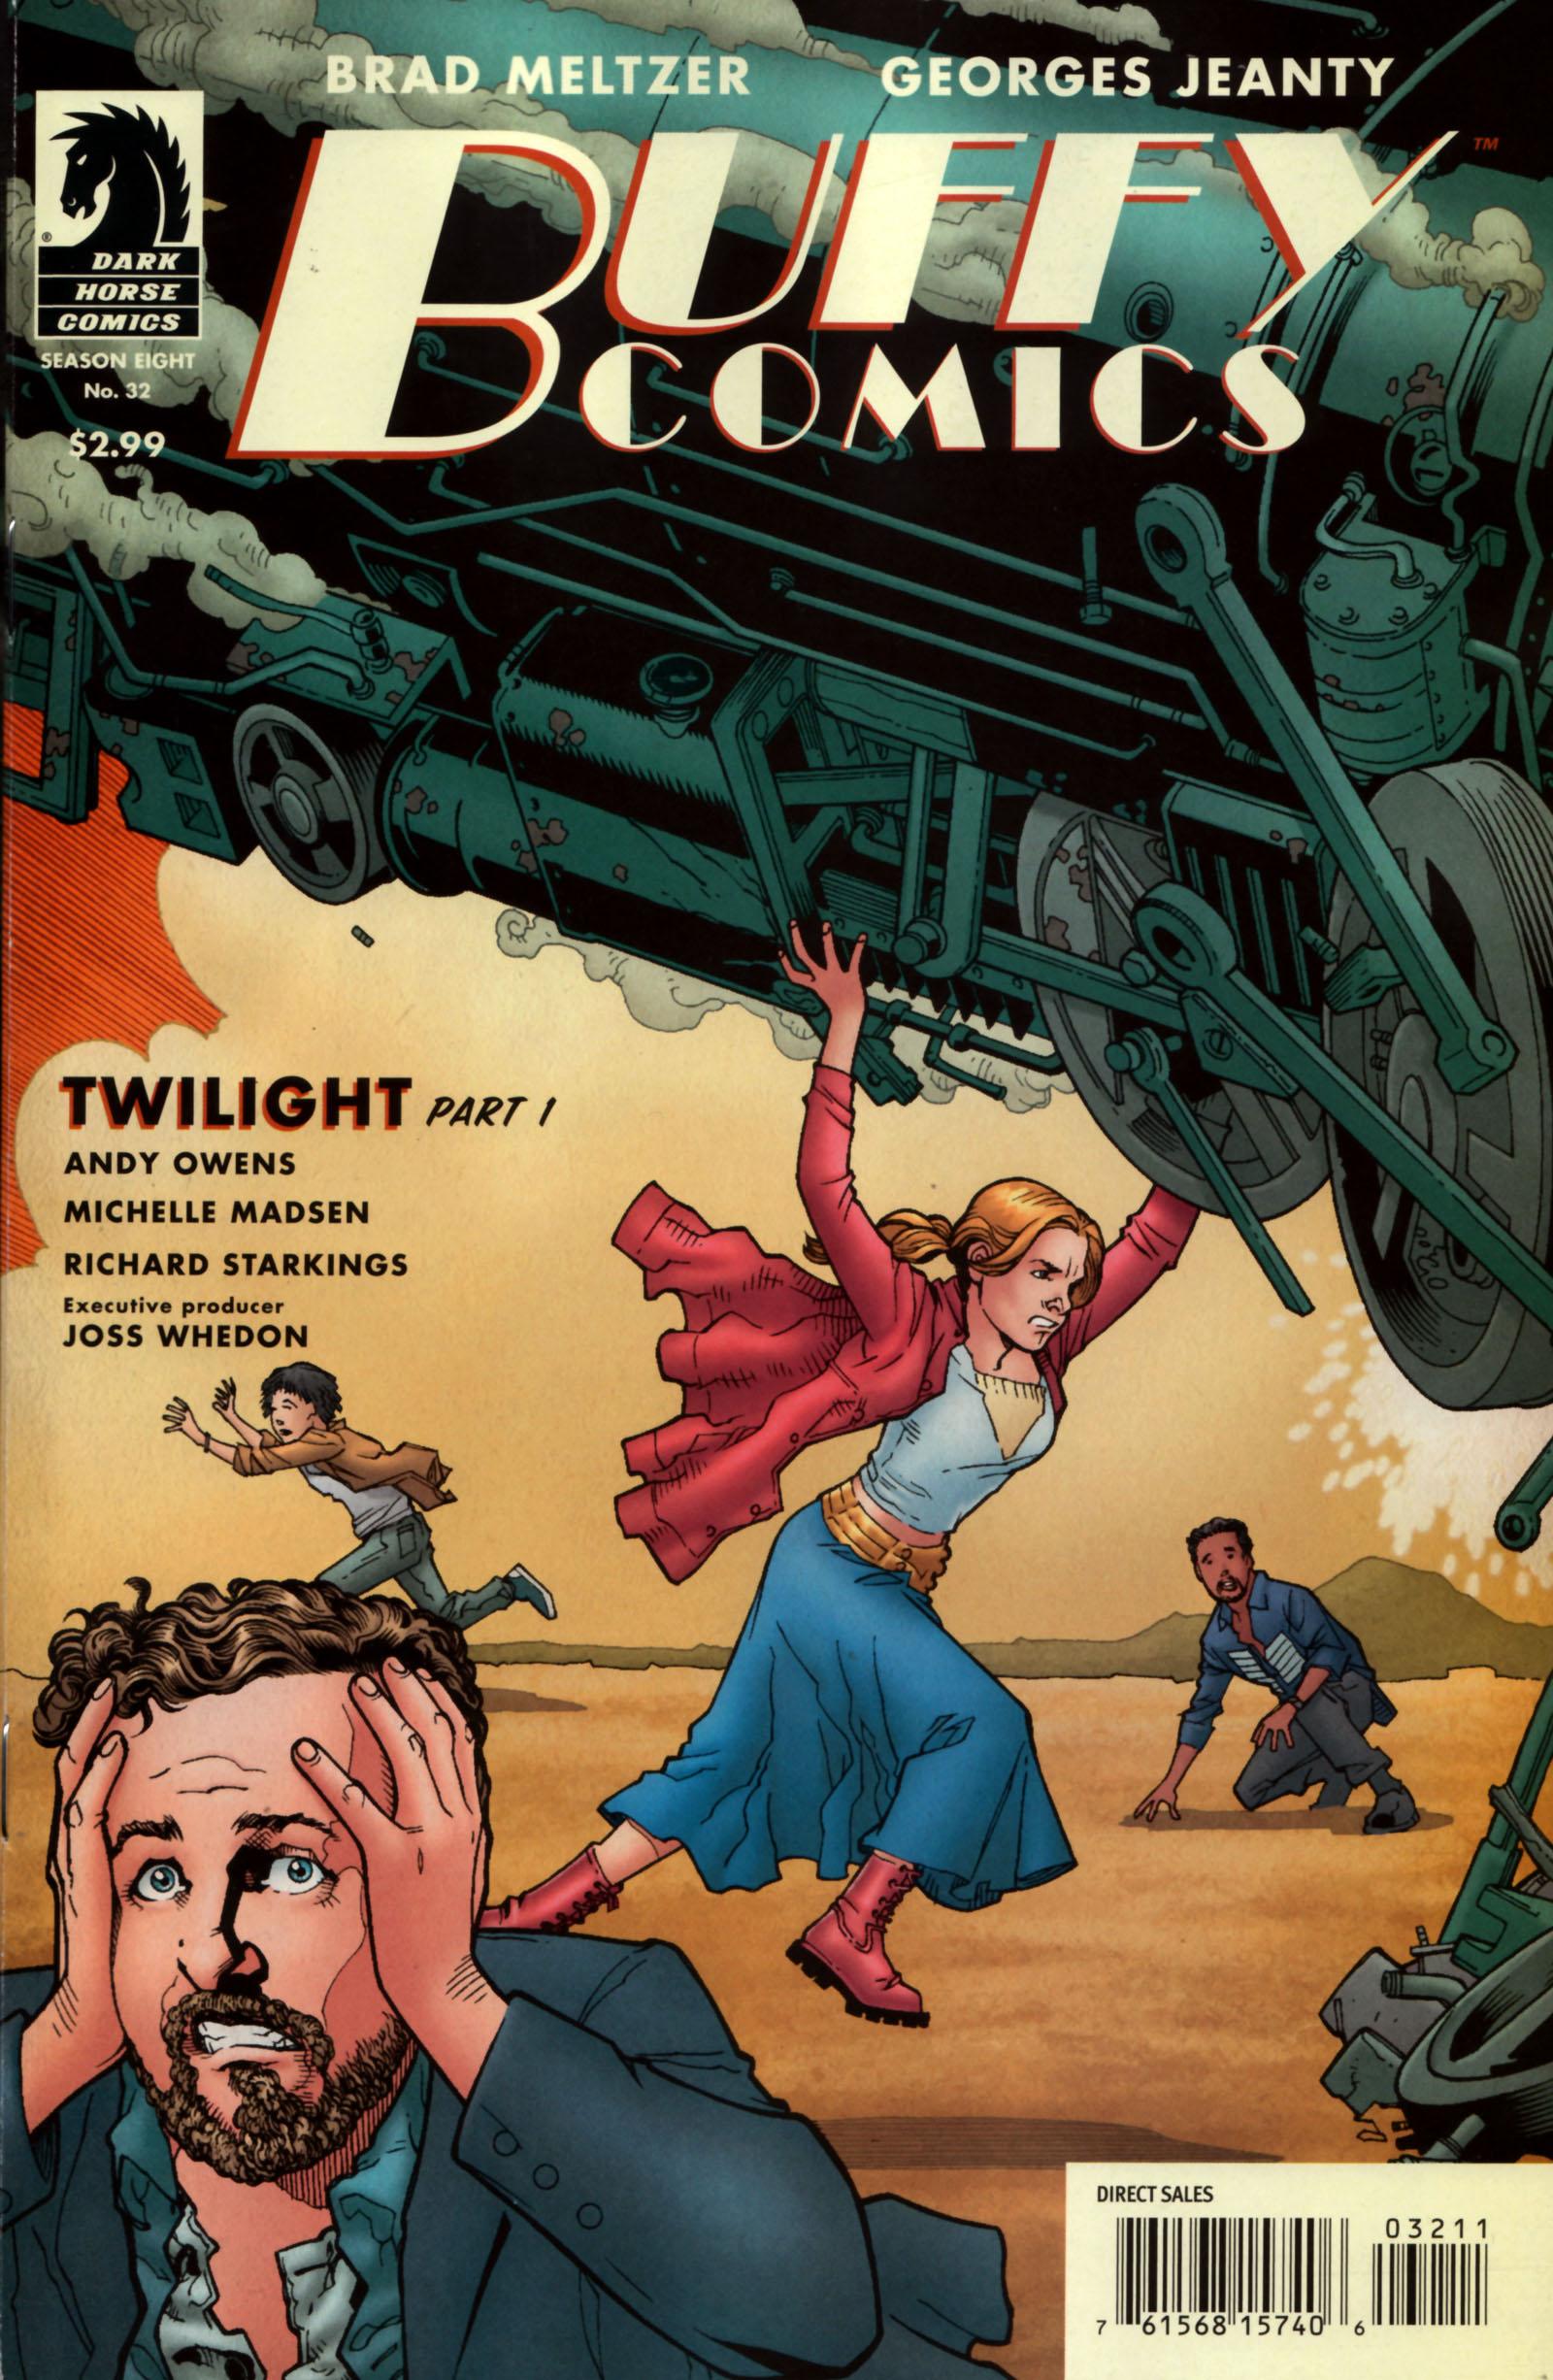 Buffy the Vampire Slayer Season Eight 32 Page 1